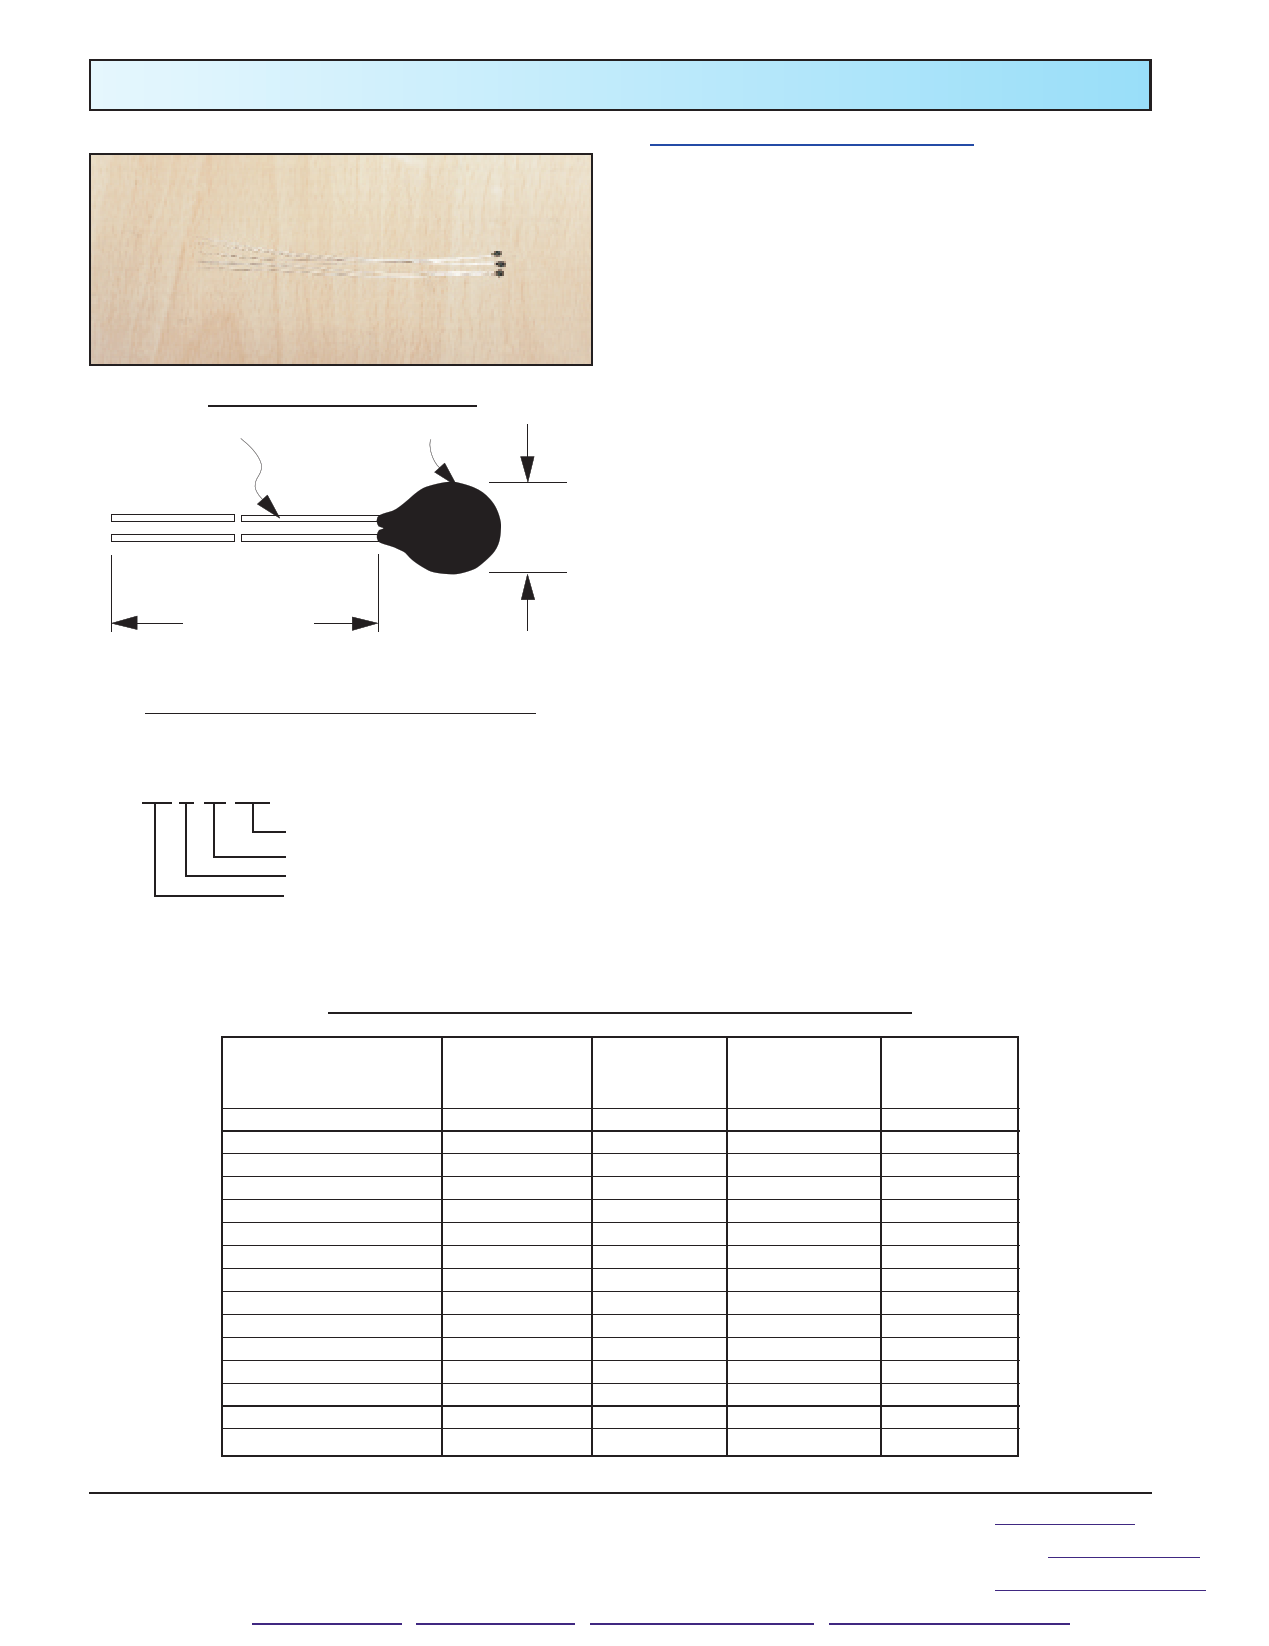 0.3K1A1-25 Hoja de datos, Descripción, Manual